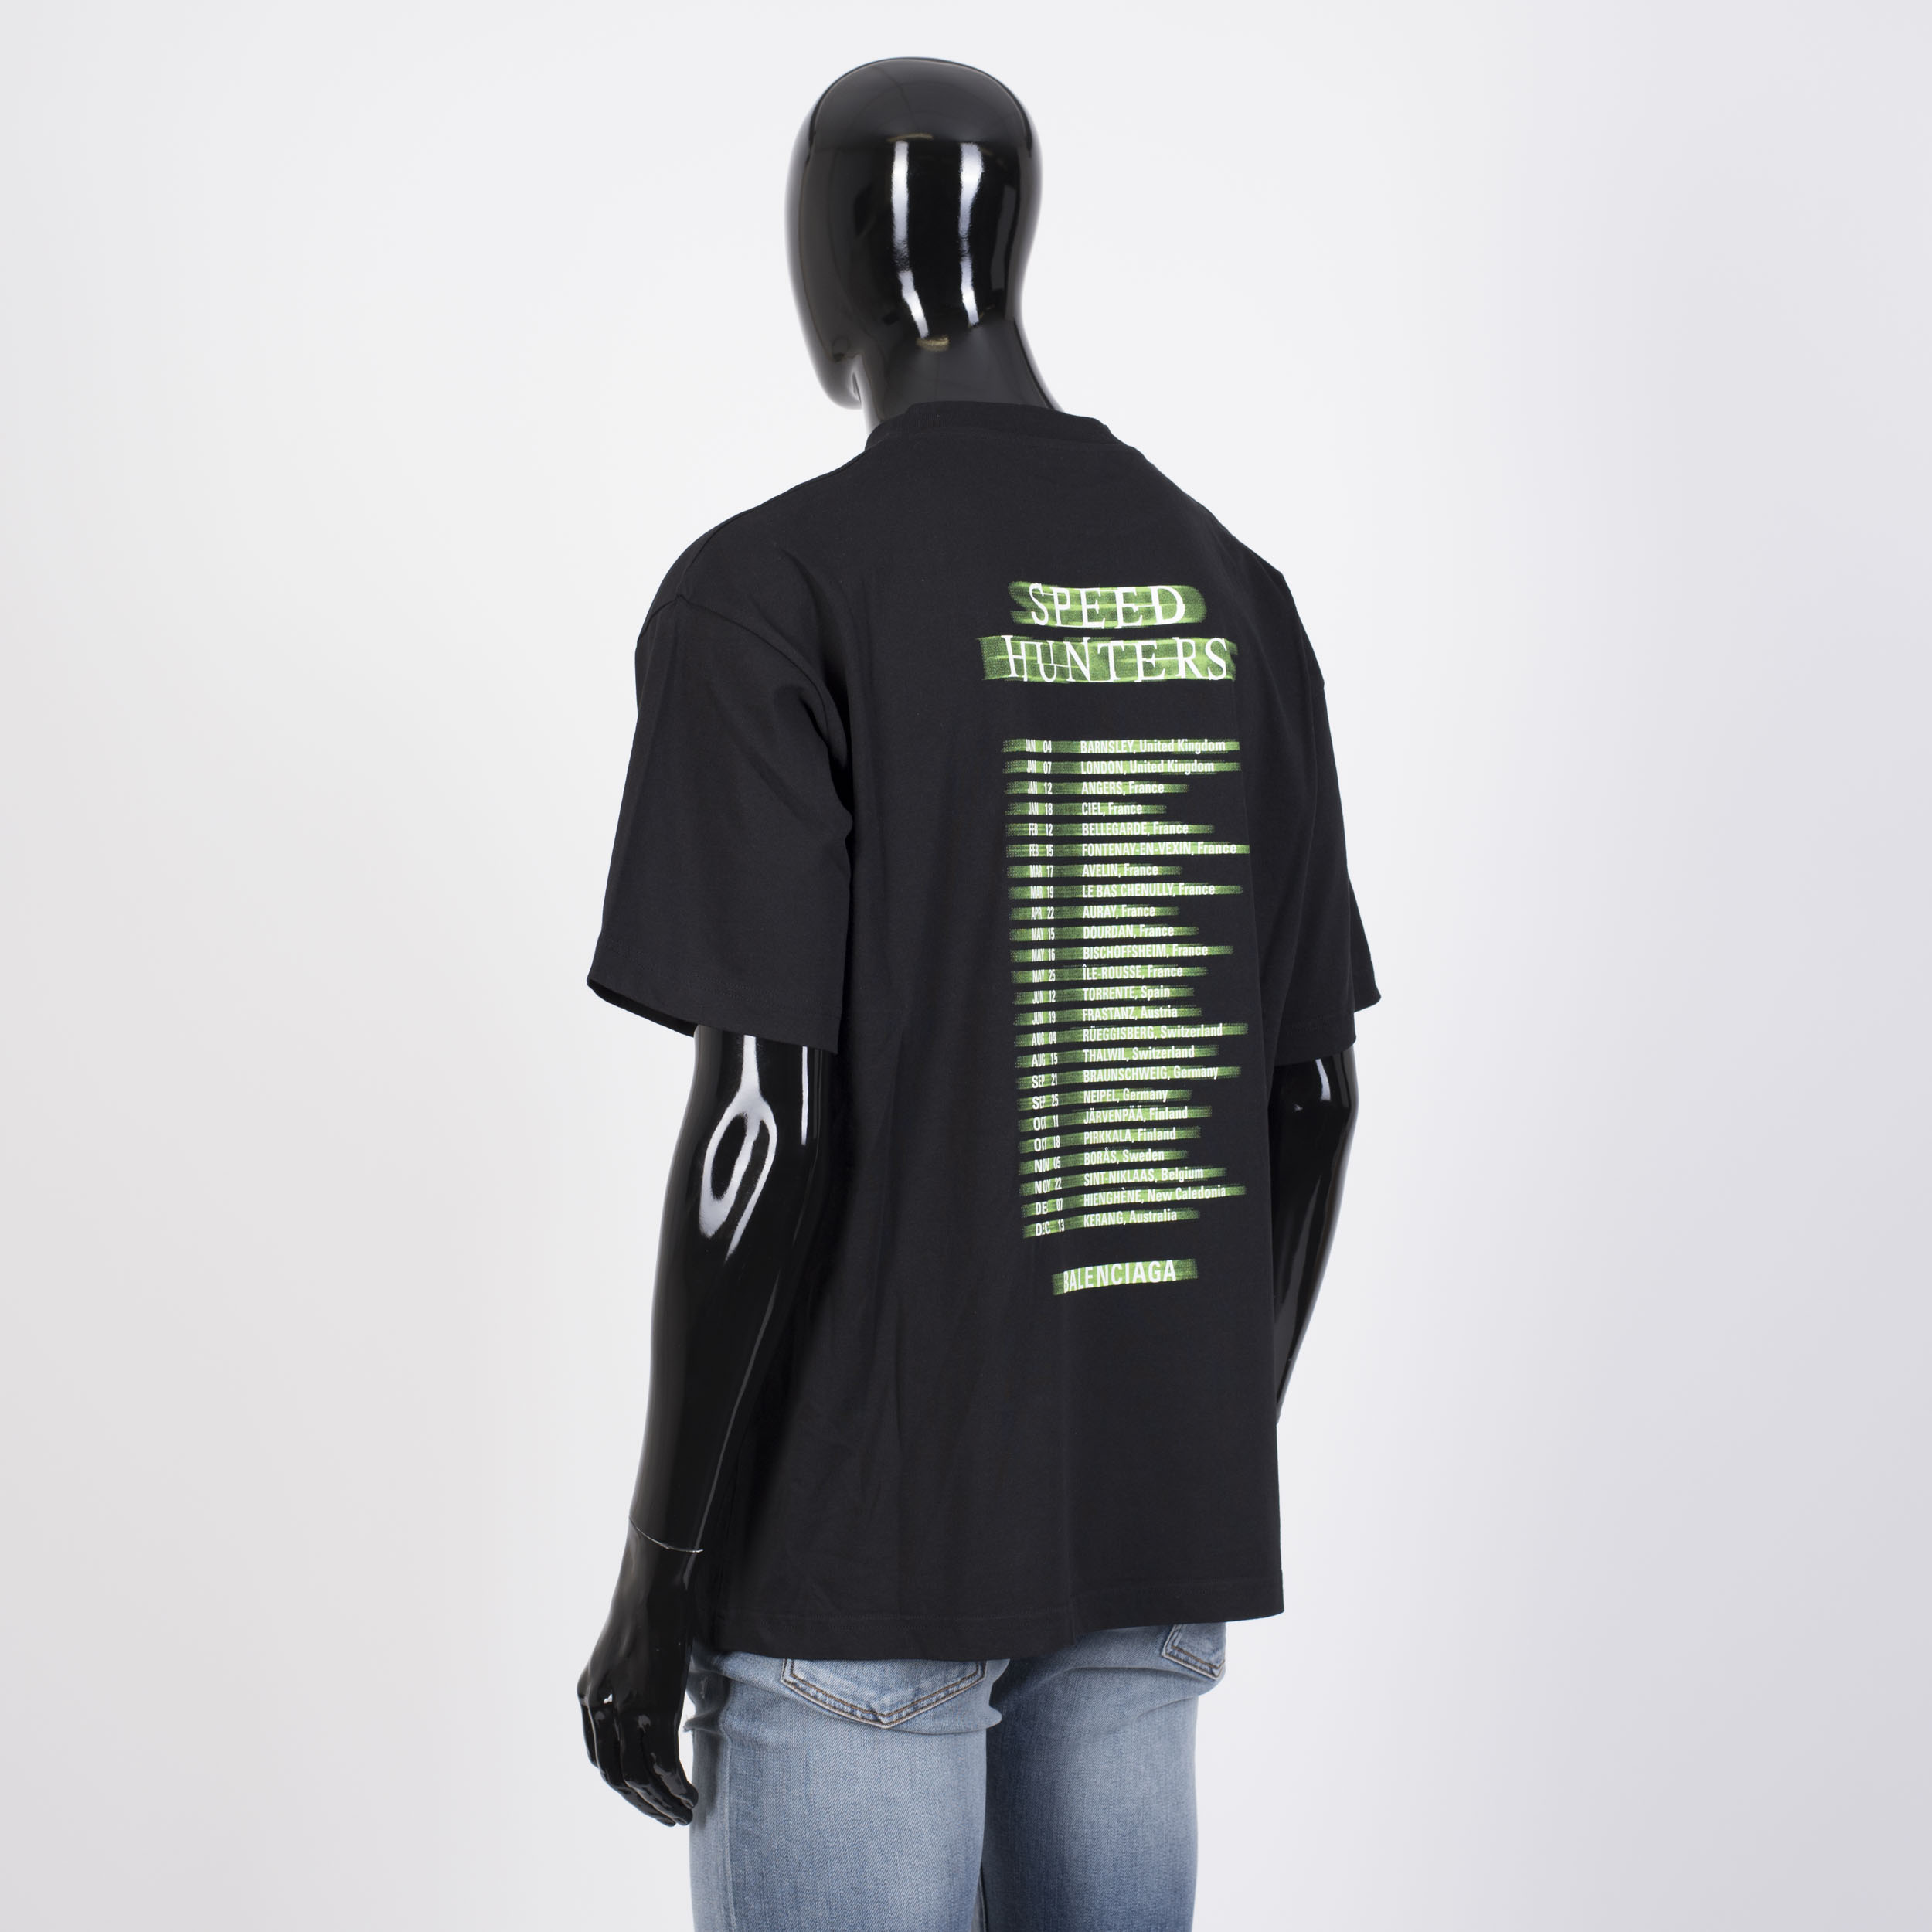 0ecac0f37e7f BALENCIAGA 550$ Oversized Speedhunters Boyband Printed Tshirt In ...